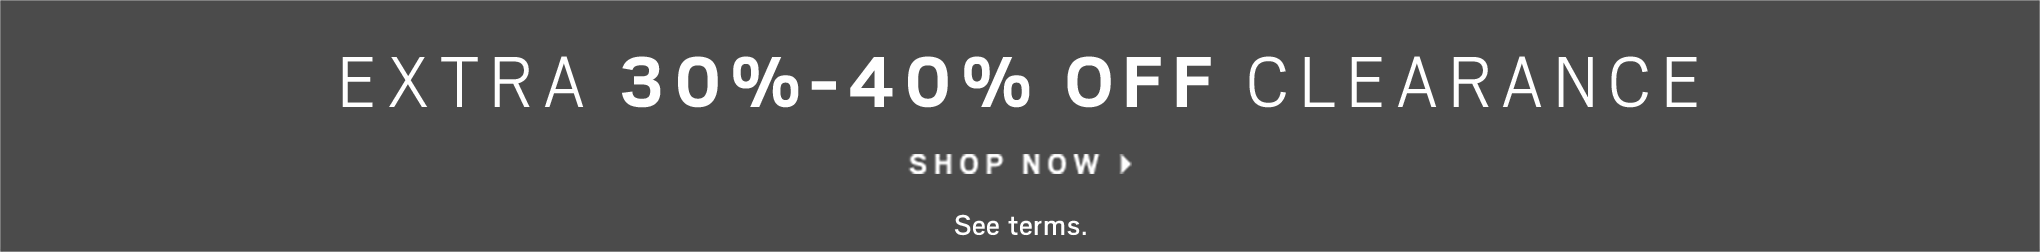 Shop Men's Clothing - Mens Suits, Dress Shirts & Sportcoats